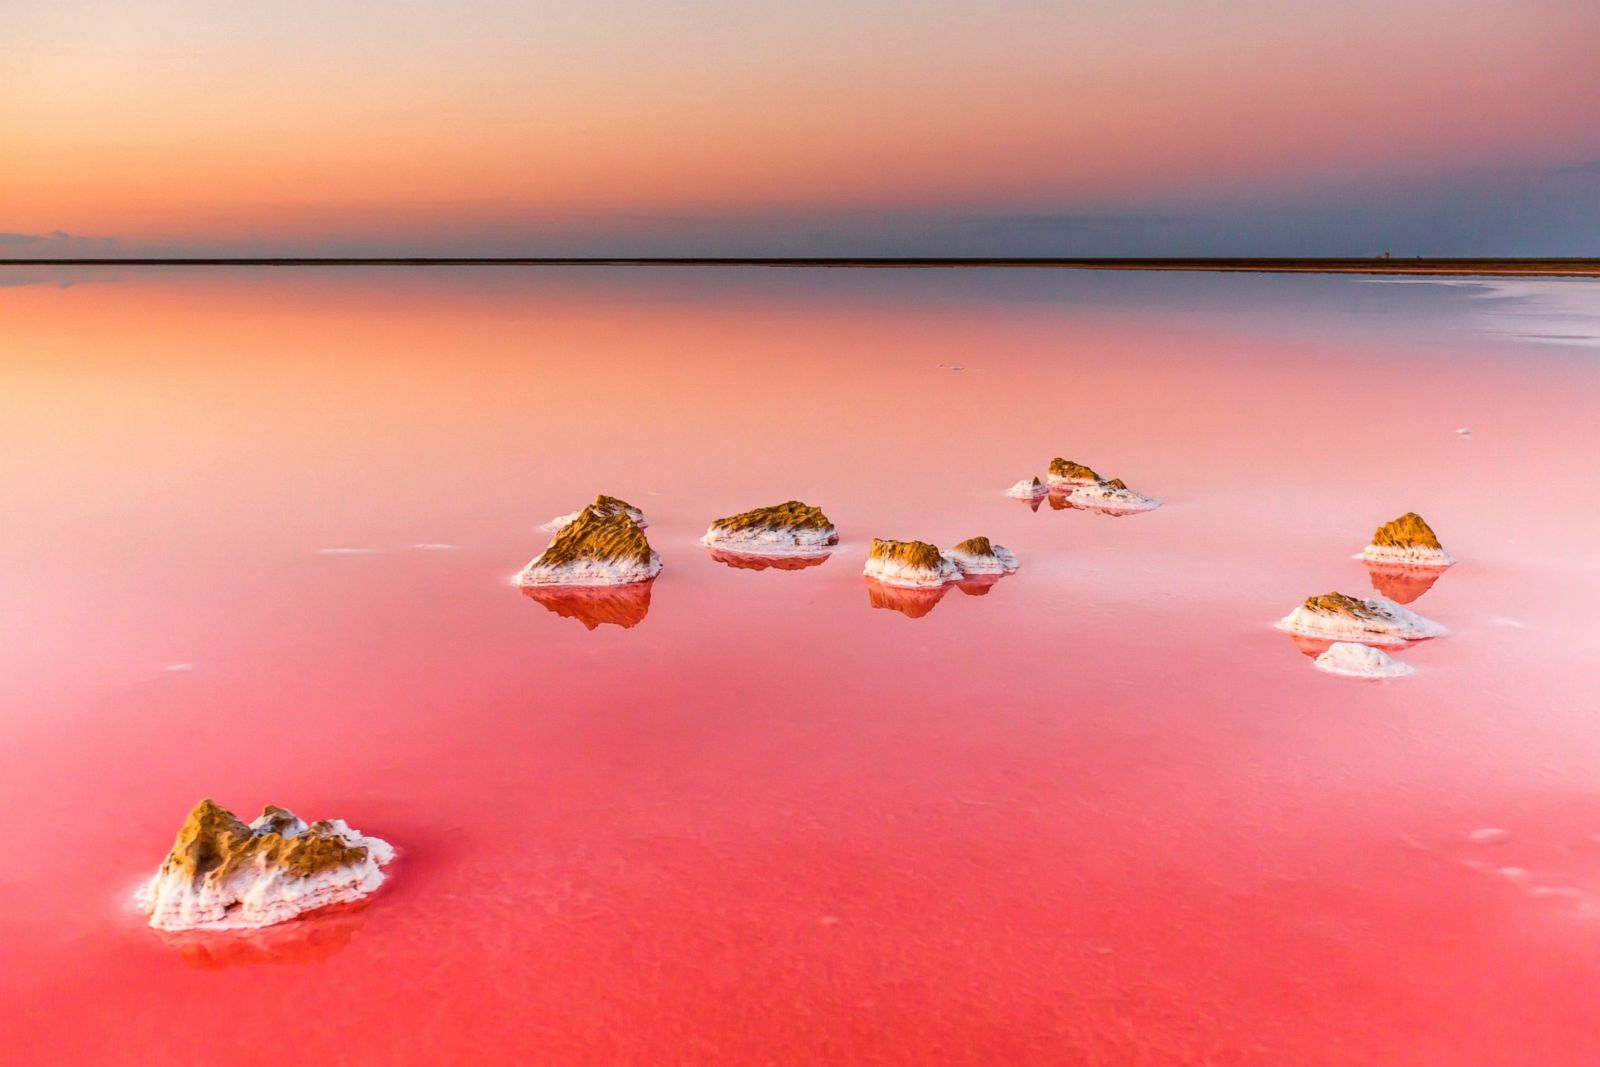 https://i0.wp.com/a.abcnews.com/images/International/cn_red_Salt_lake_Koyashskoye4_wg_150612_3x2_1600.jpg